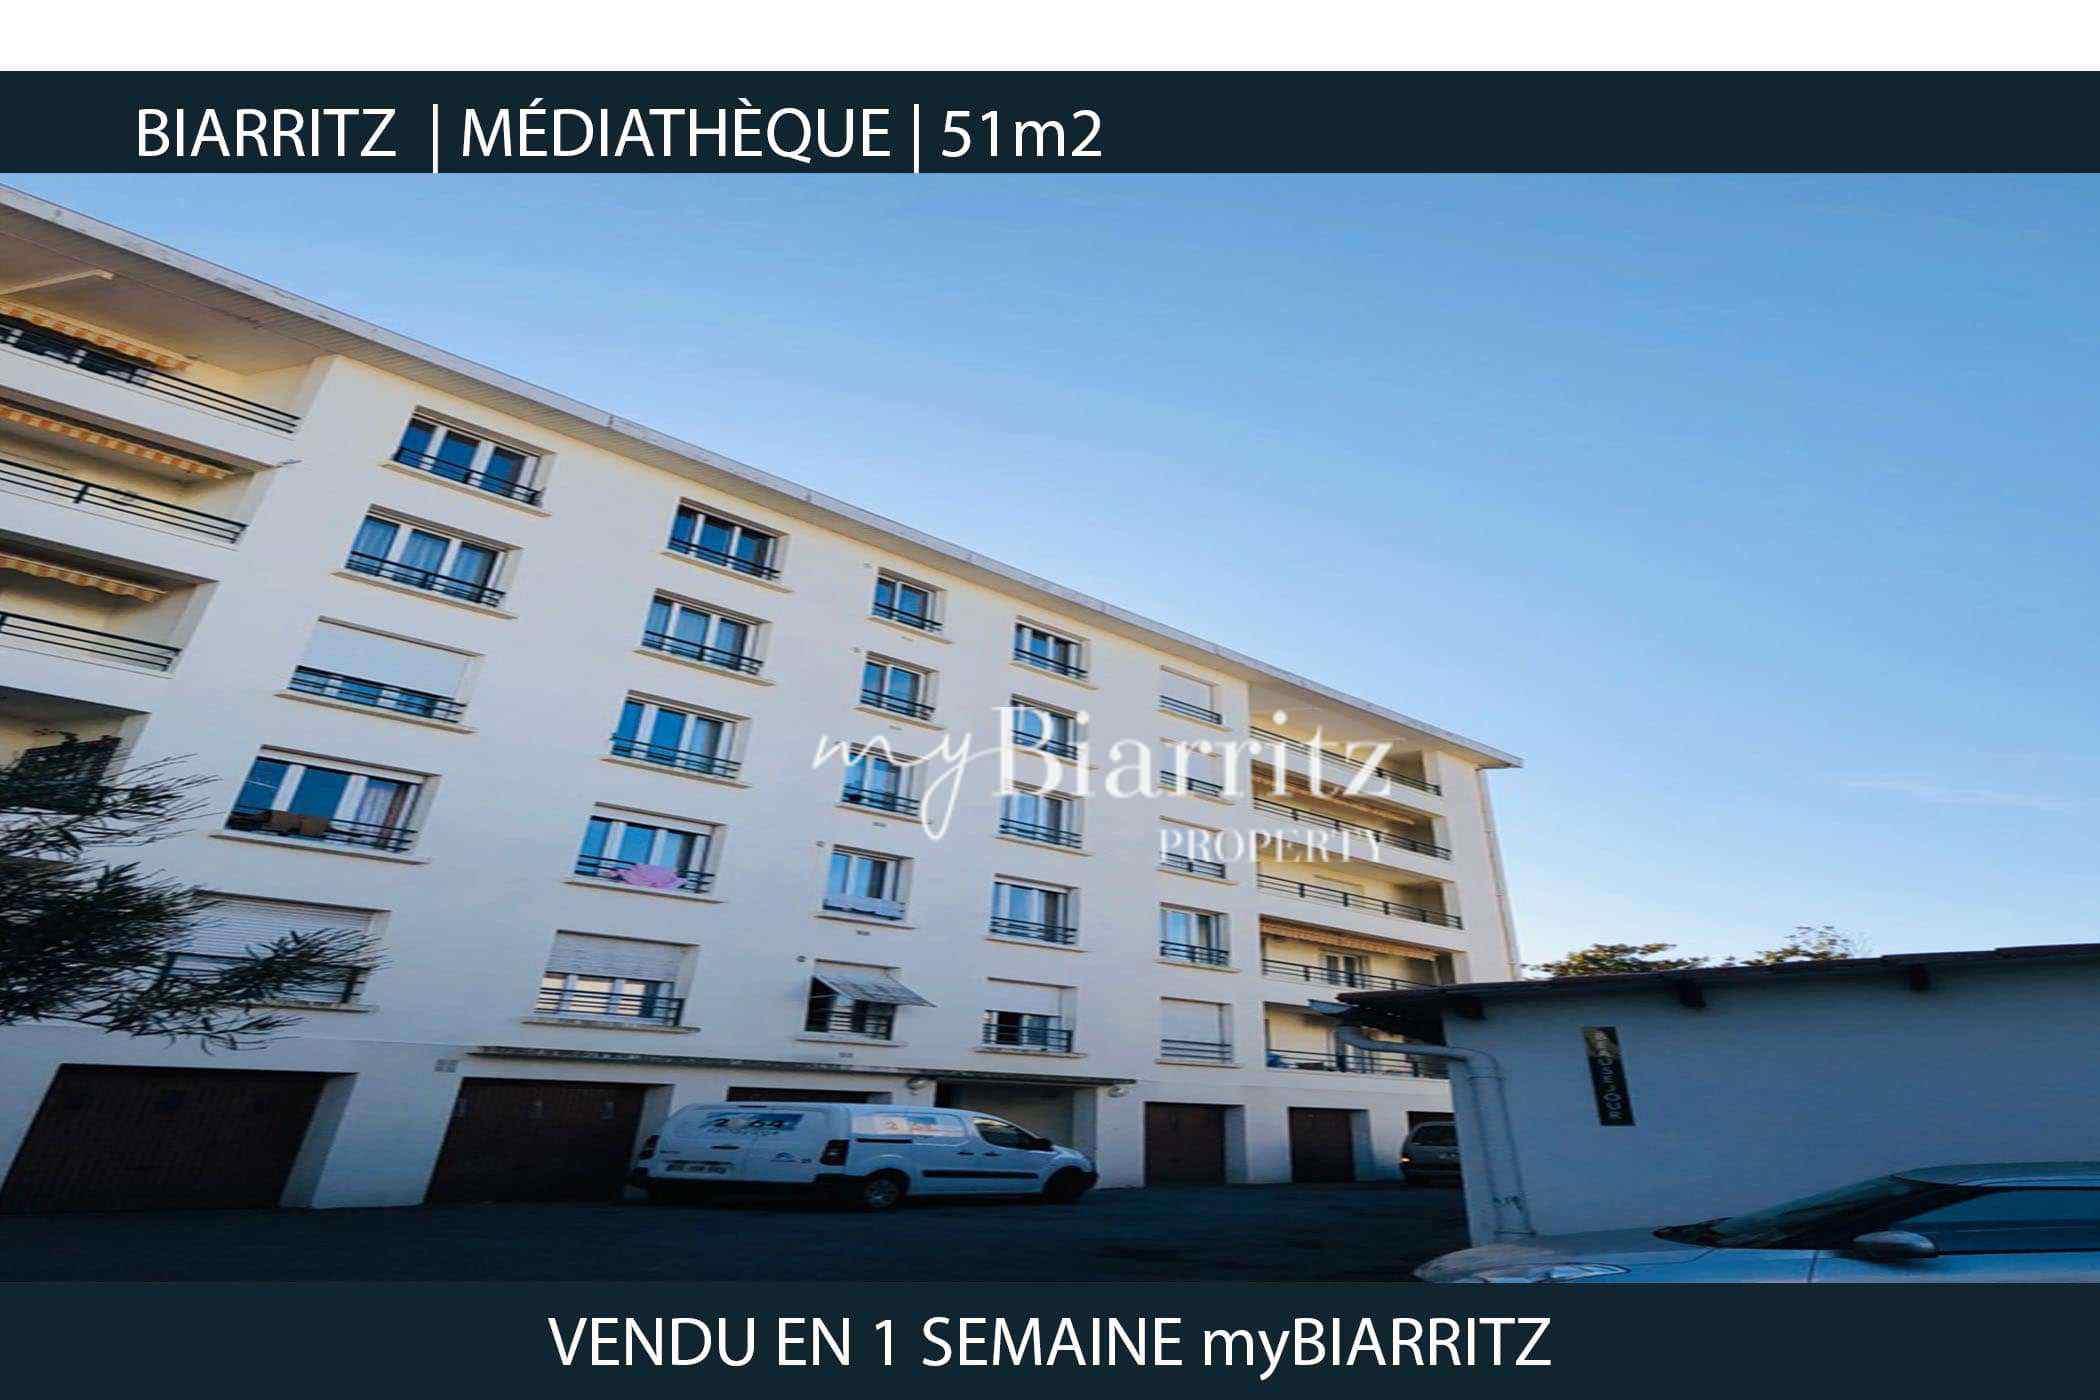 BIARRITZ-mediatheque